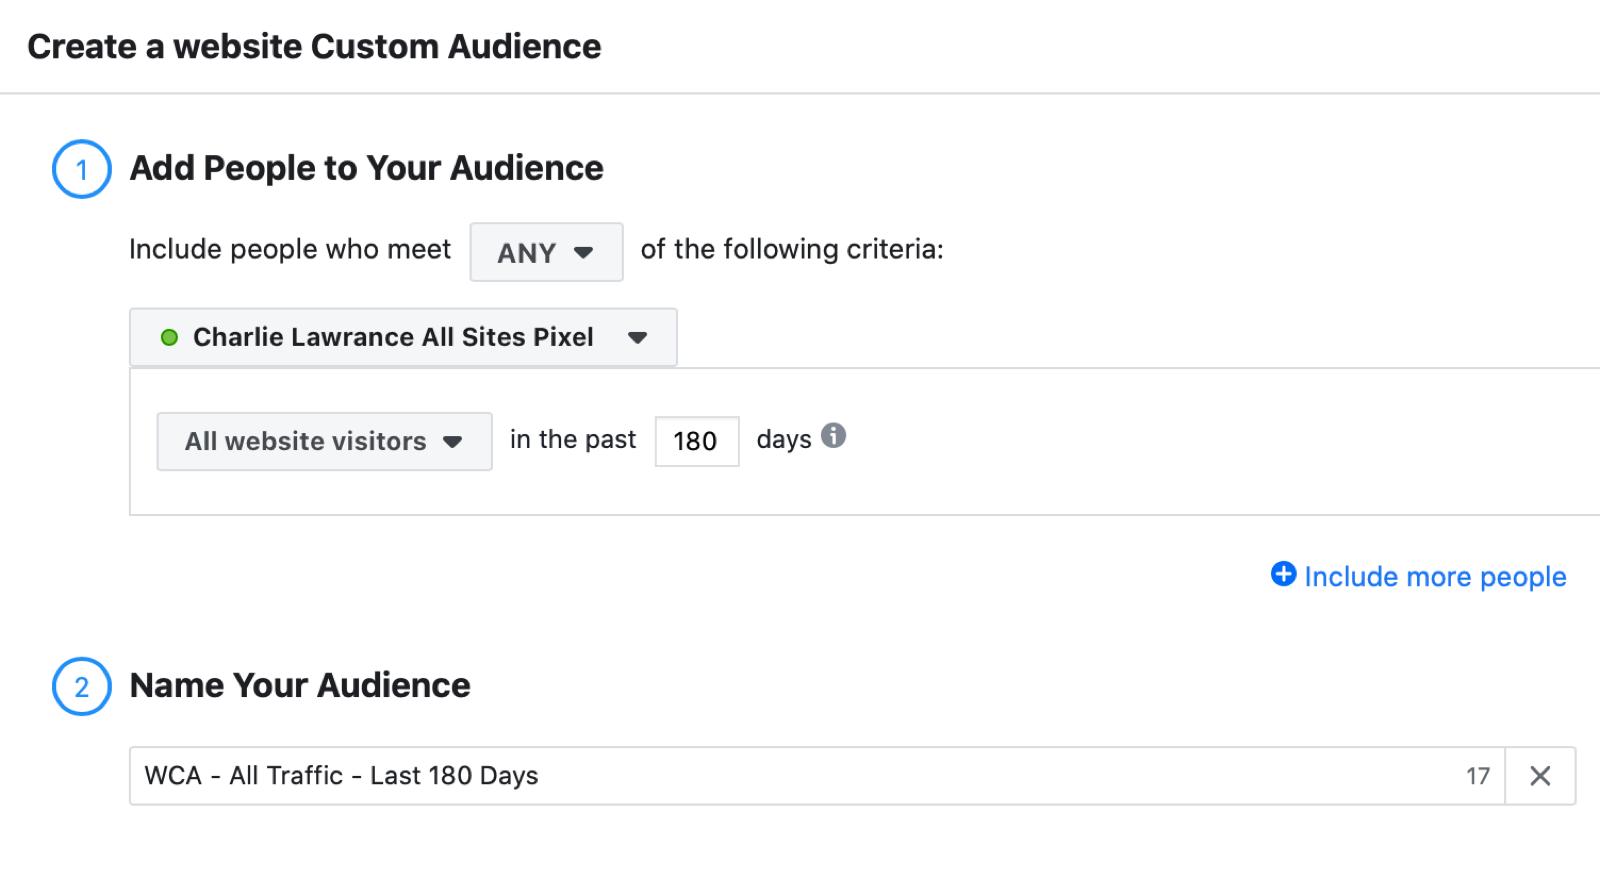 Facebook网站针对推荐广告的自定义受众设置